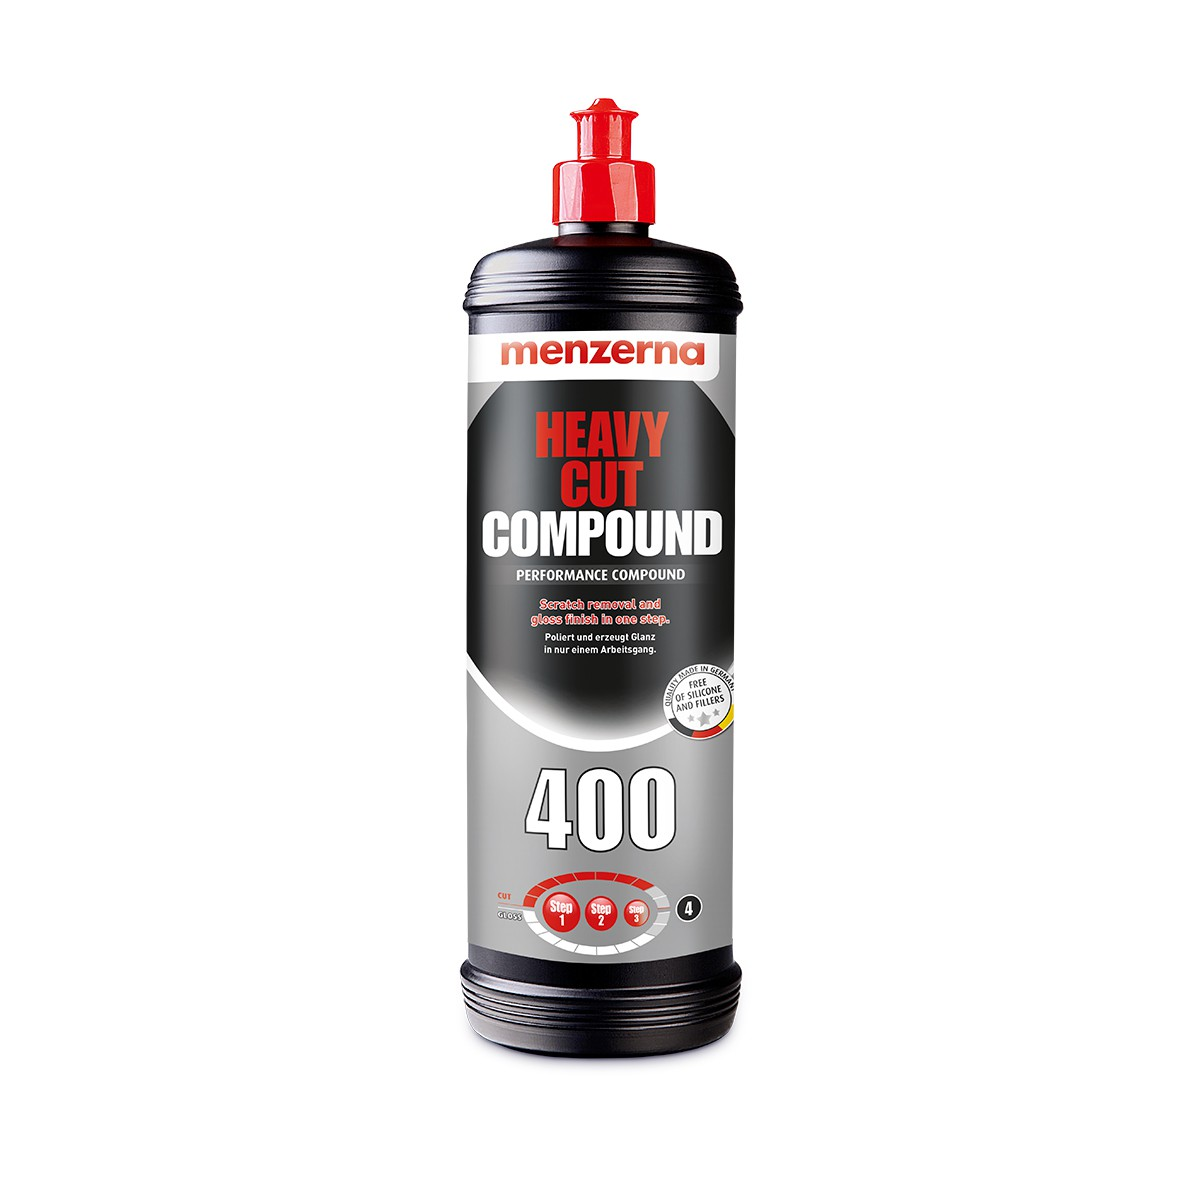 Heavy Cut Coumpound 400 - FG400 1L - Menzerna